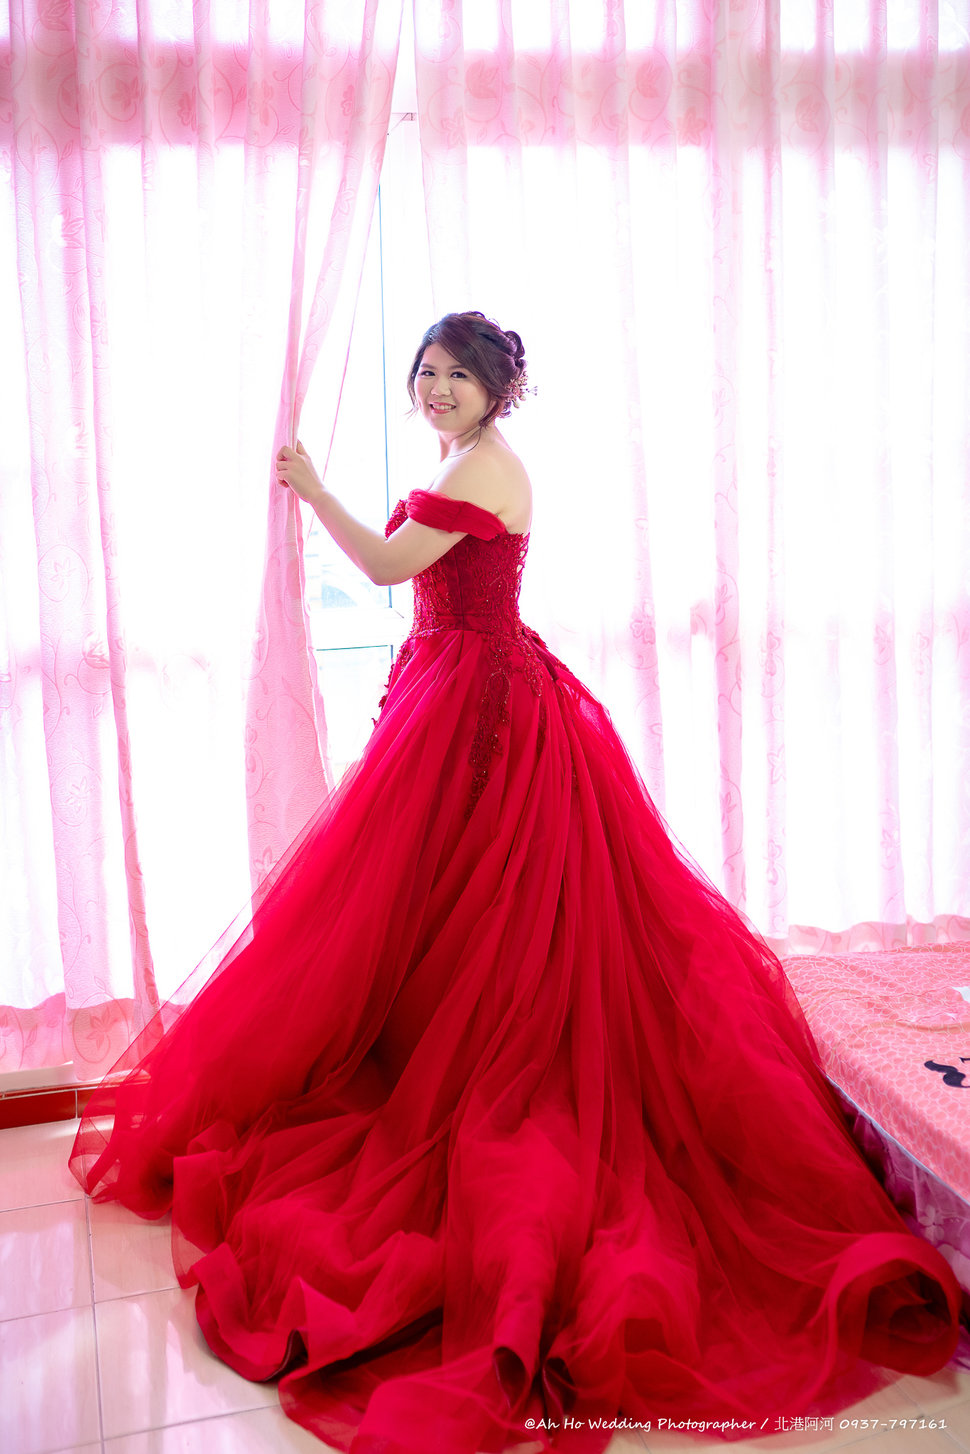 AhHo Wedding TEL-0937797161 lineID-chiupeiho-27 - 北港阿河婚攝 AhHoWedding - 結婚吧